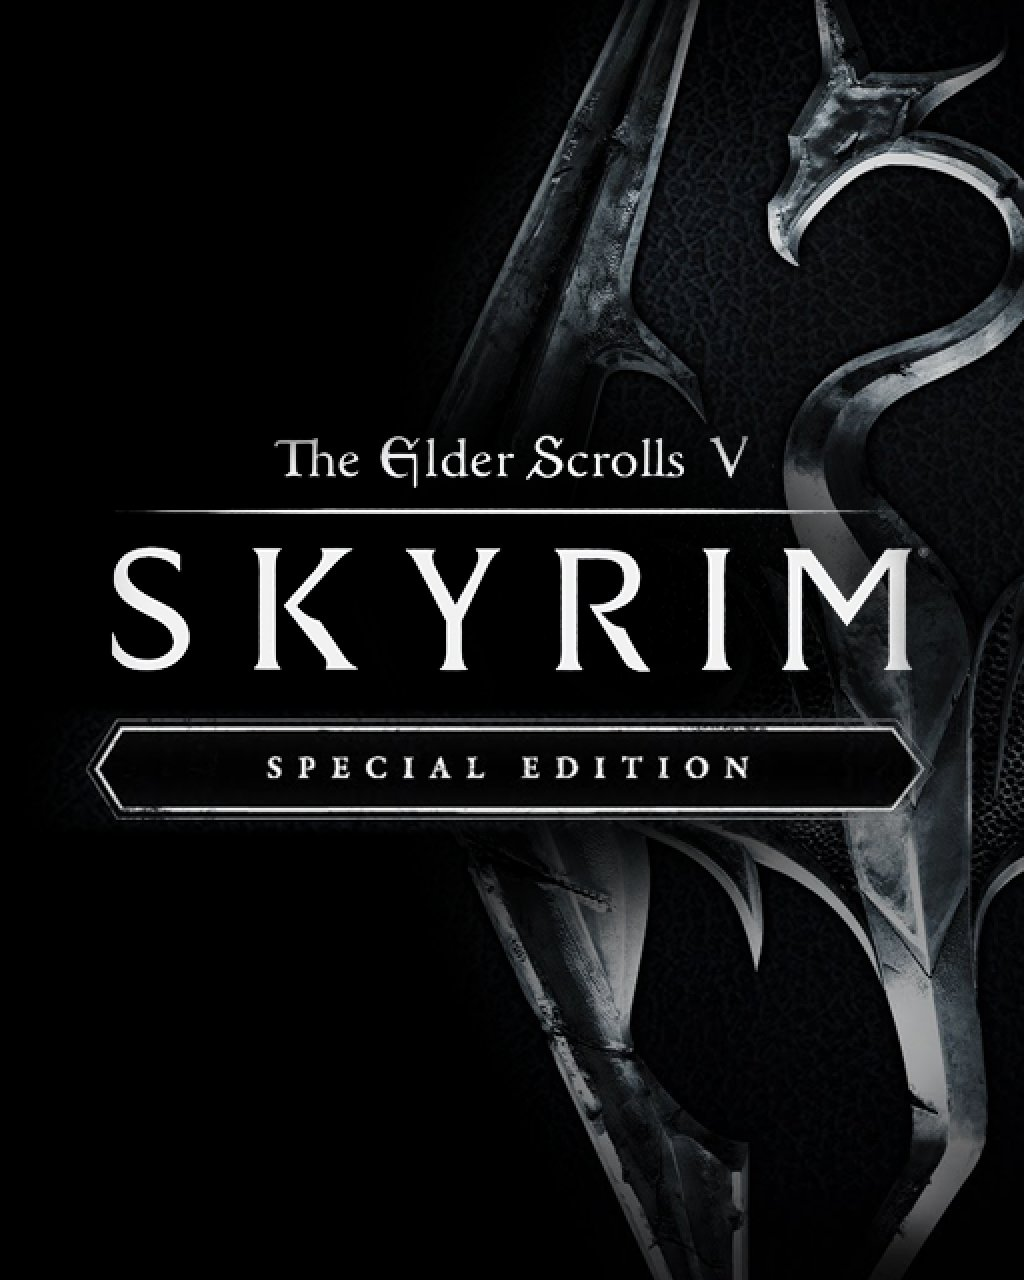 The Elder Scrolls V Skyrim Special Edition krabice